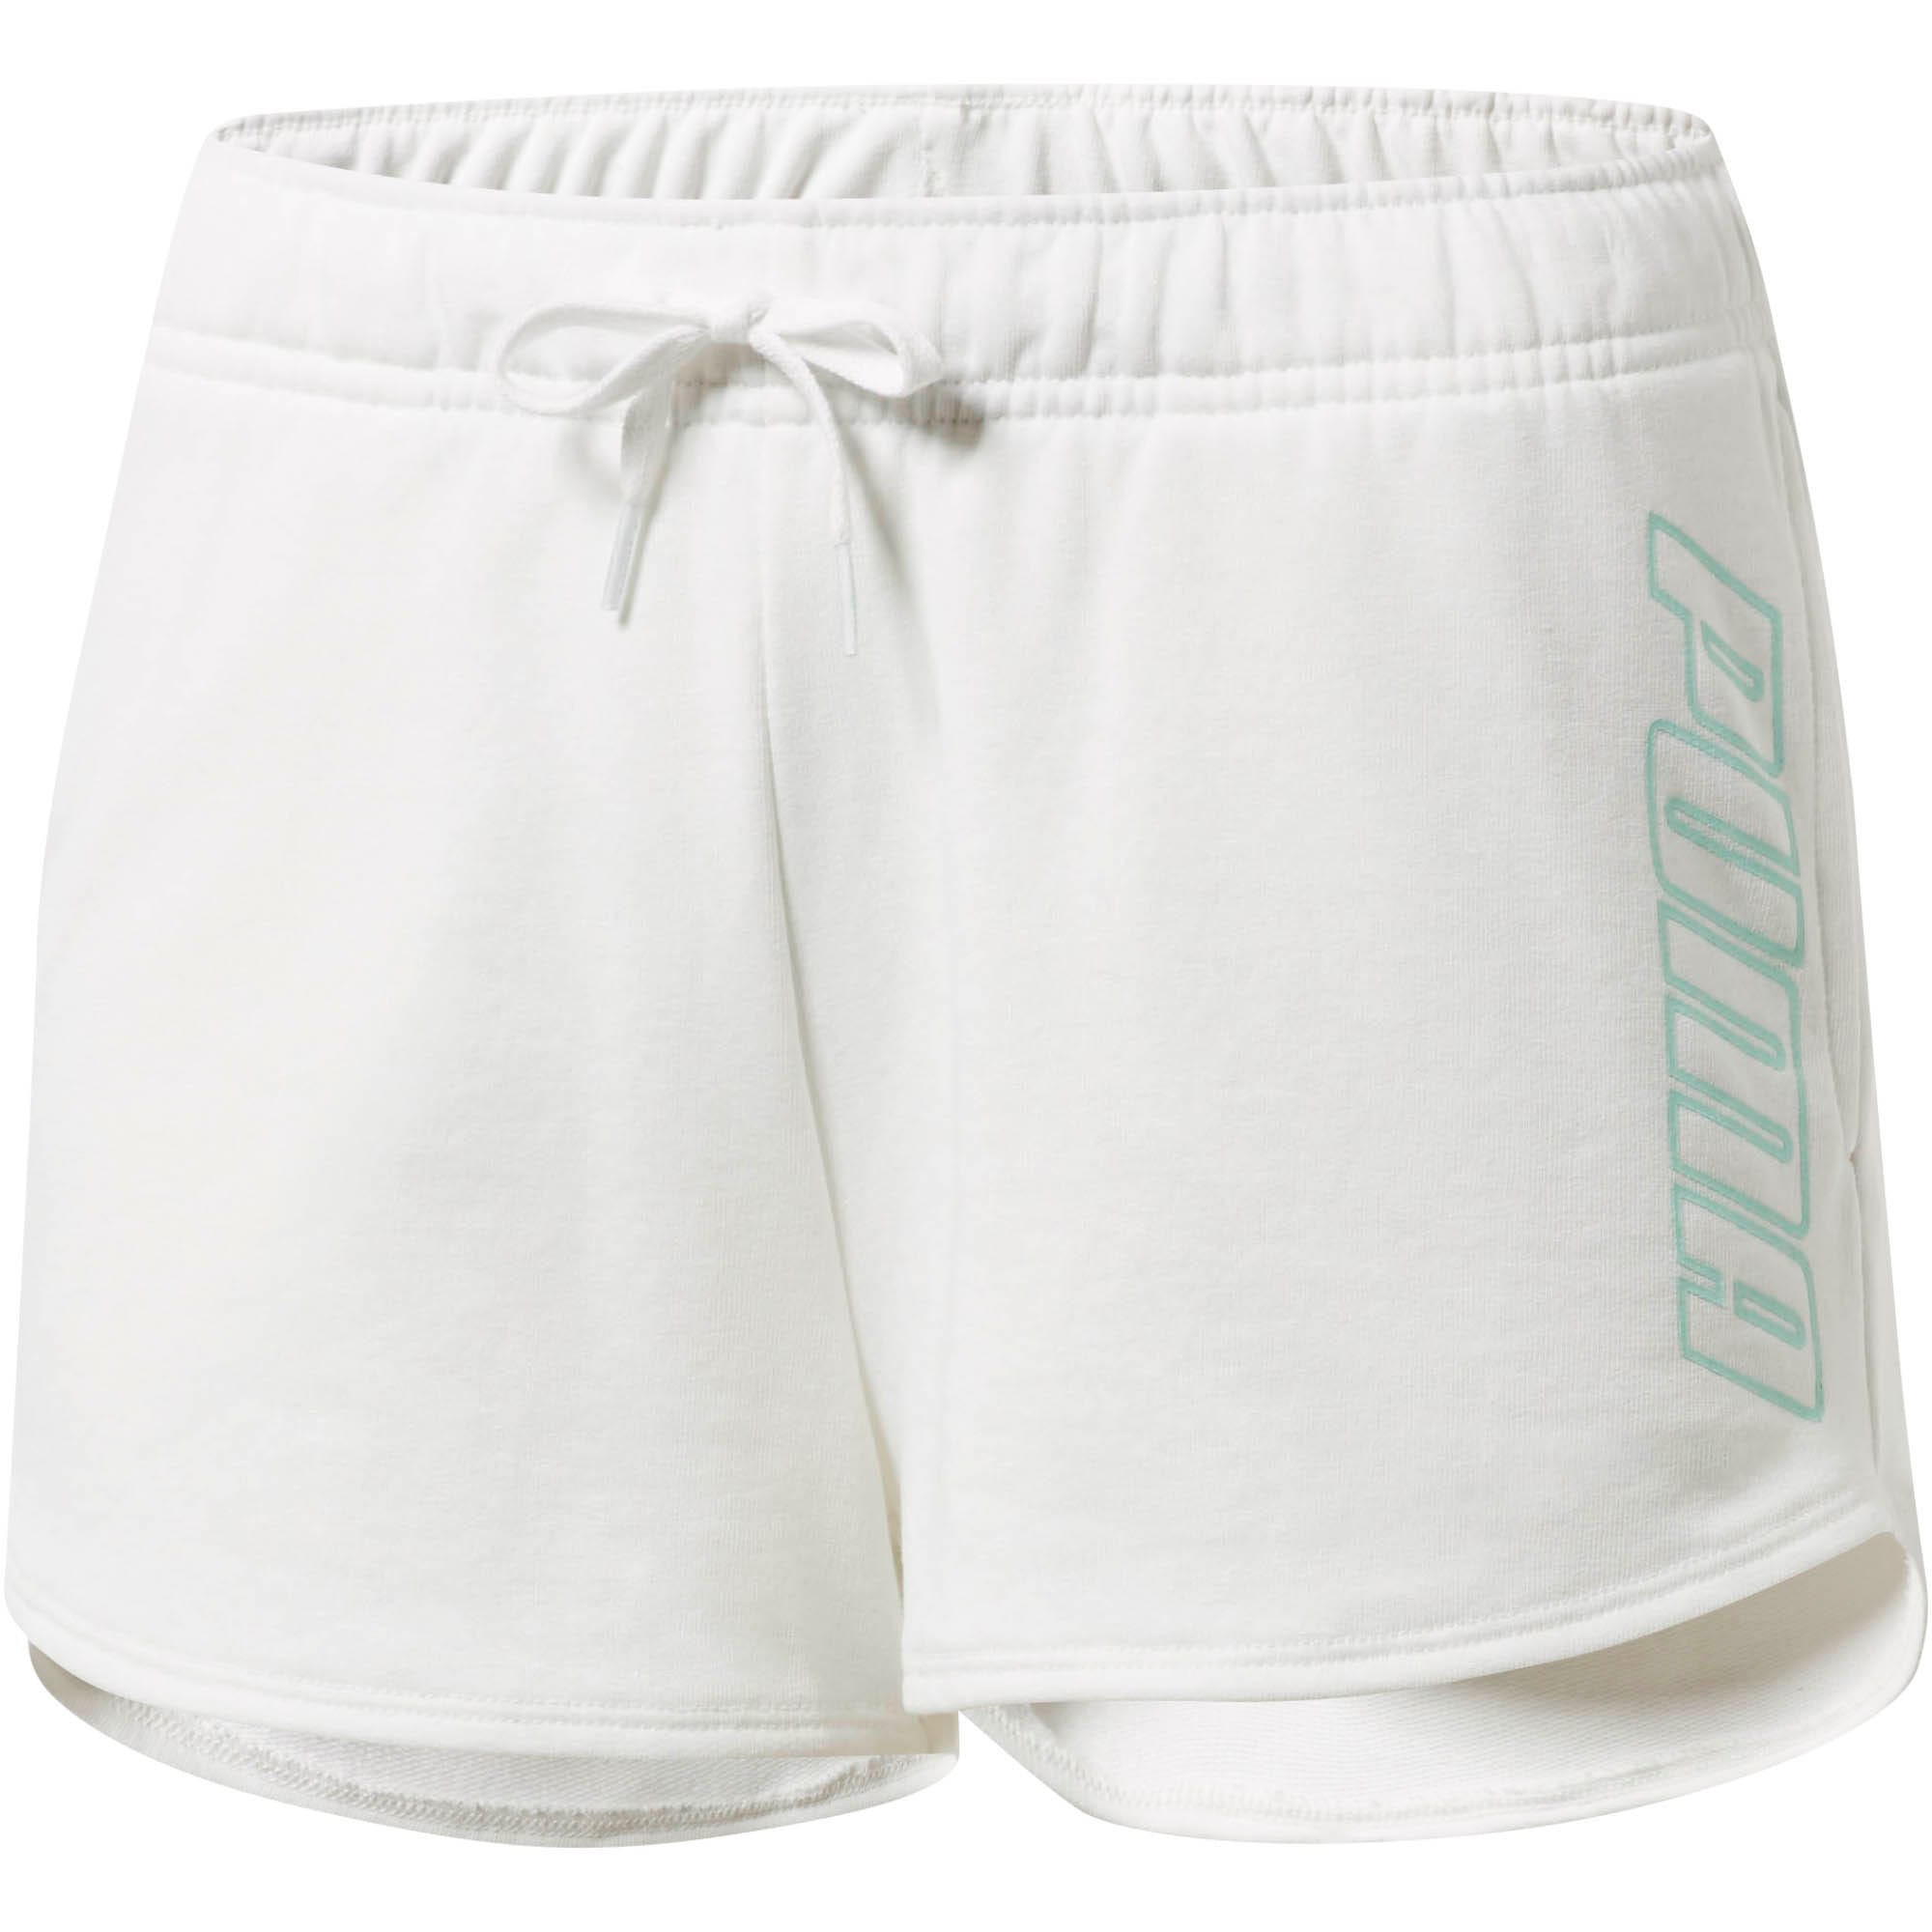 Miniatura 1 de Short de otro mundo, Puma White, mediano